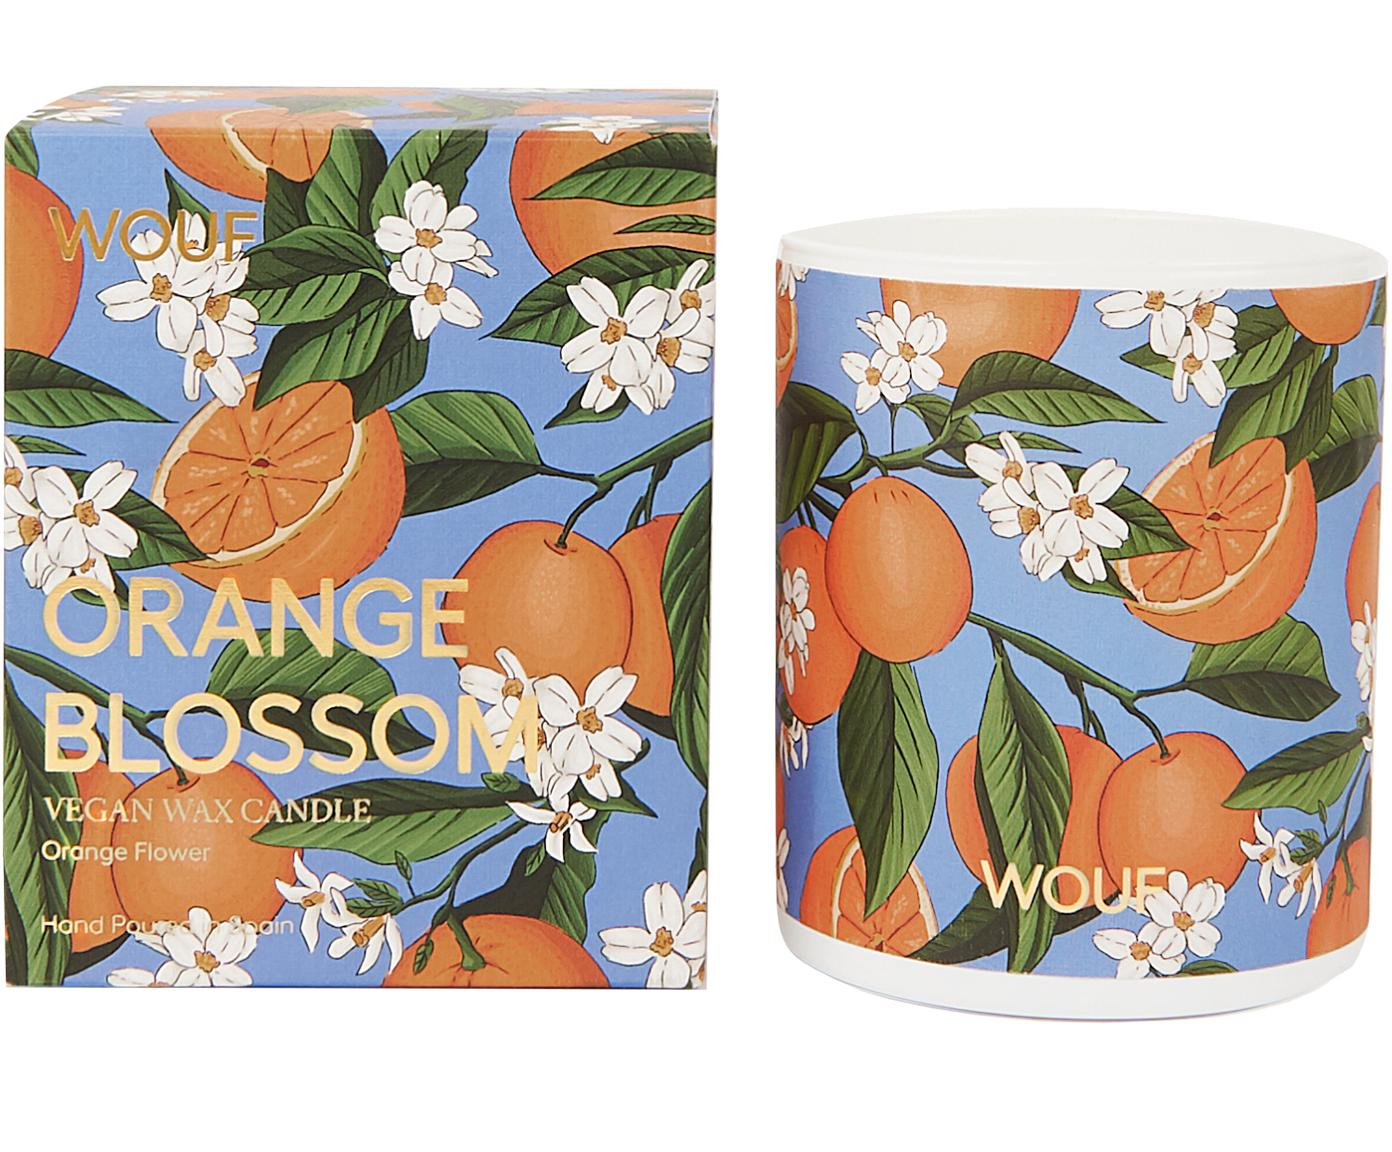 Vegane Duftkerze Orange Blossom (Orangenblüte), Behälter: Glas, Orange, Ø 8 x H 10 cm